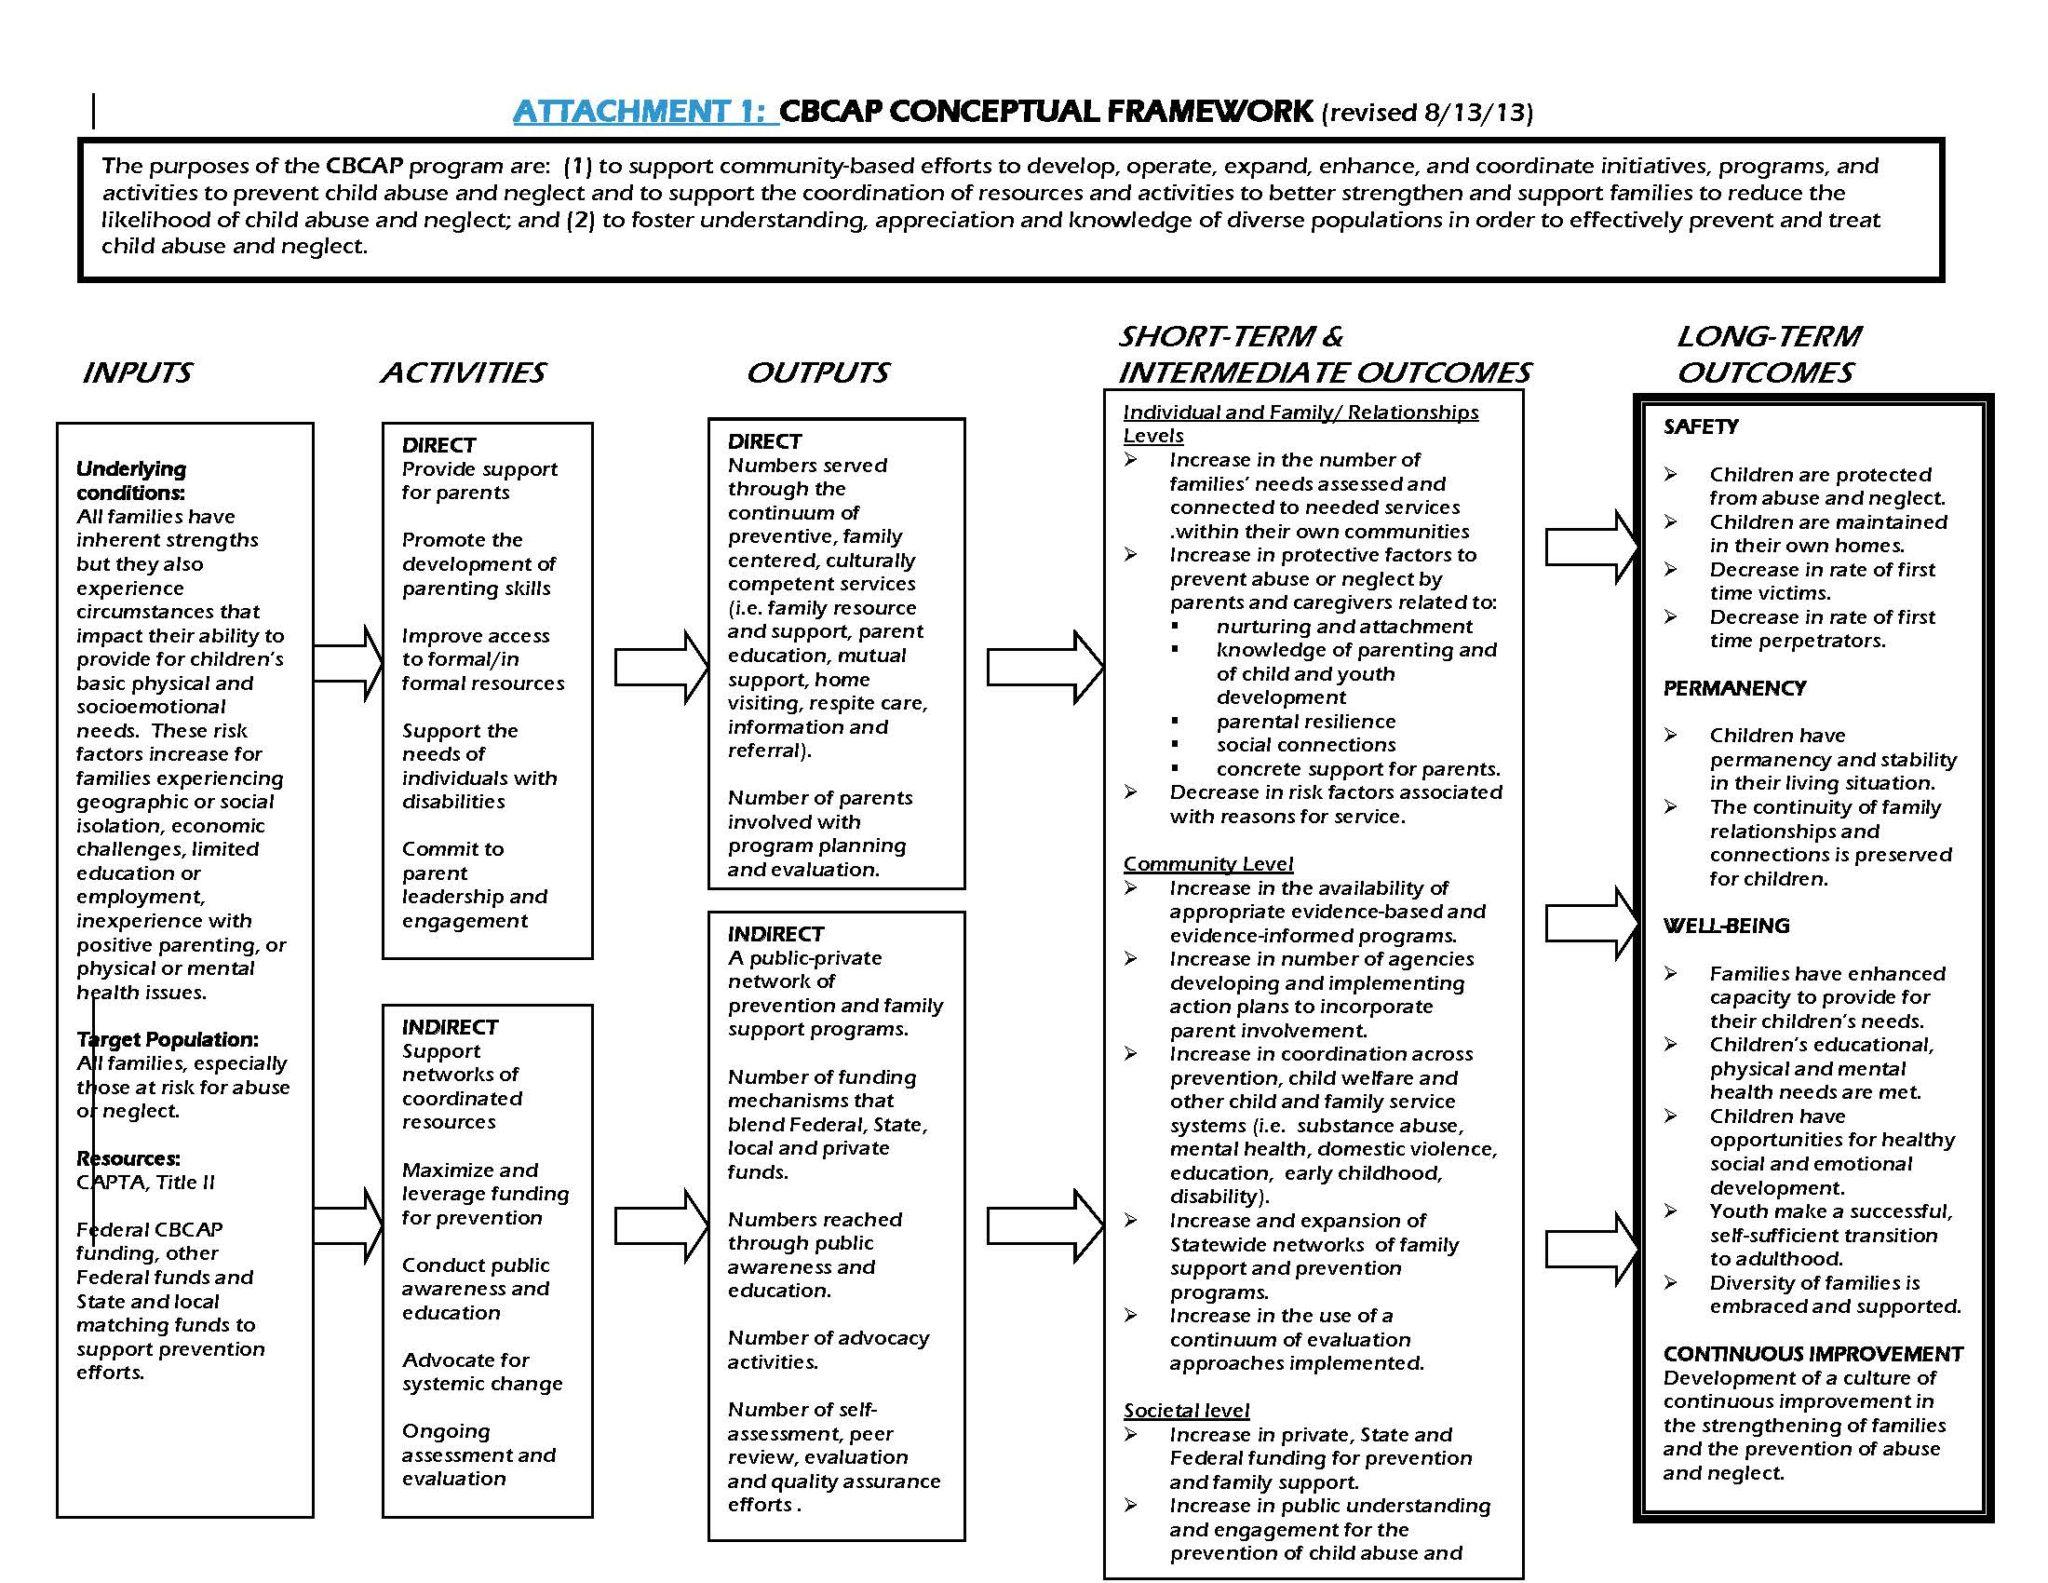 CBCAP Conceptual Framework